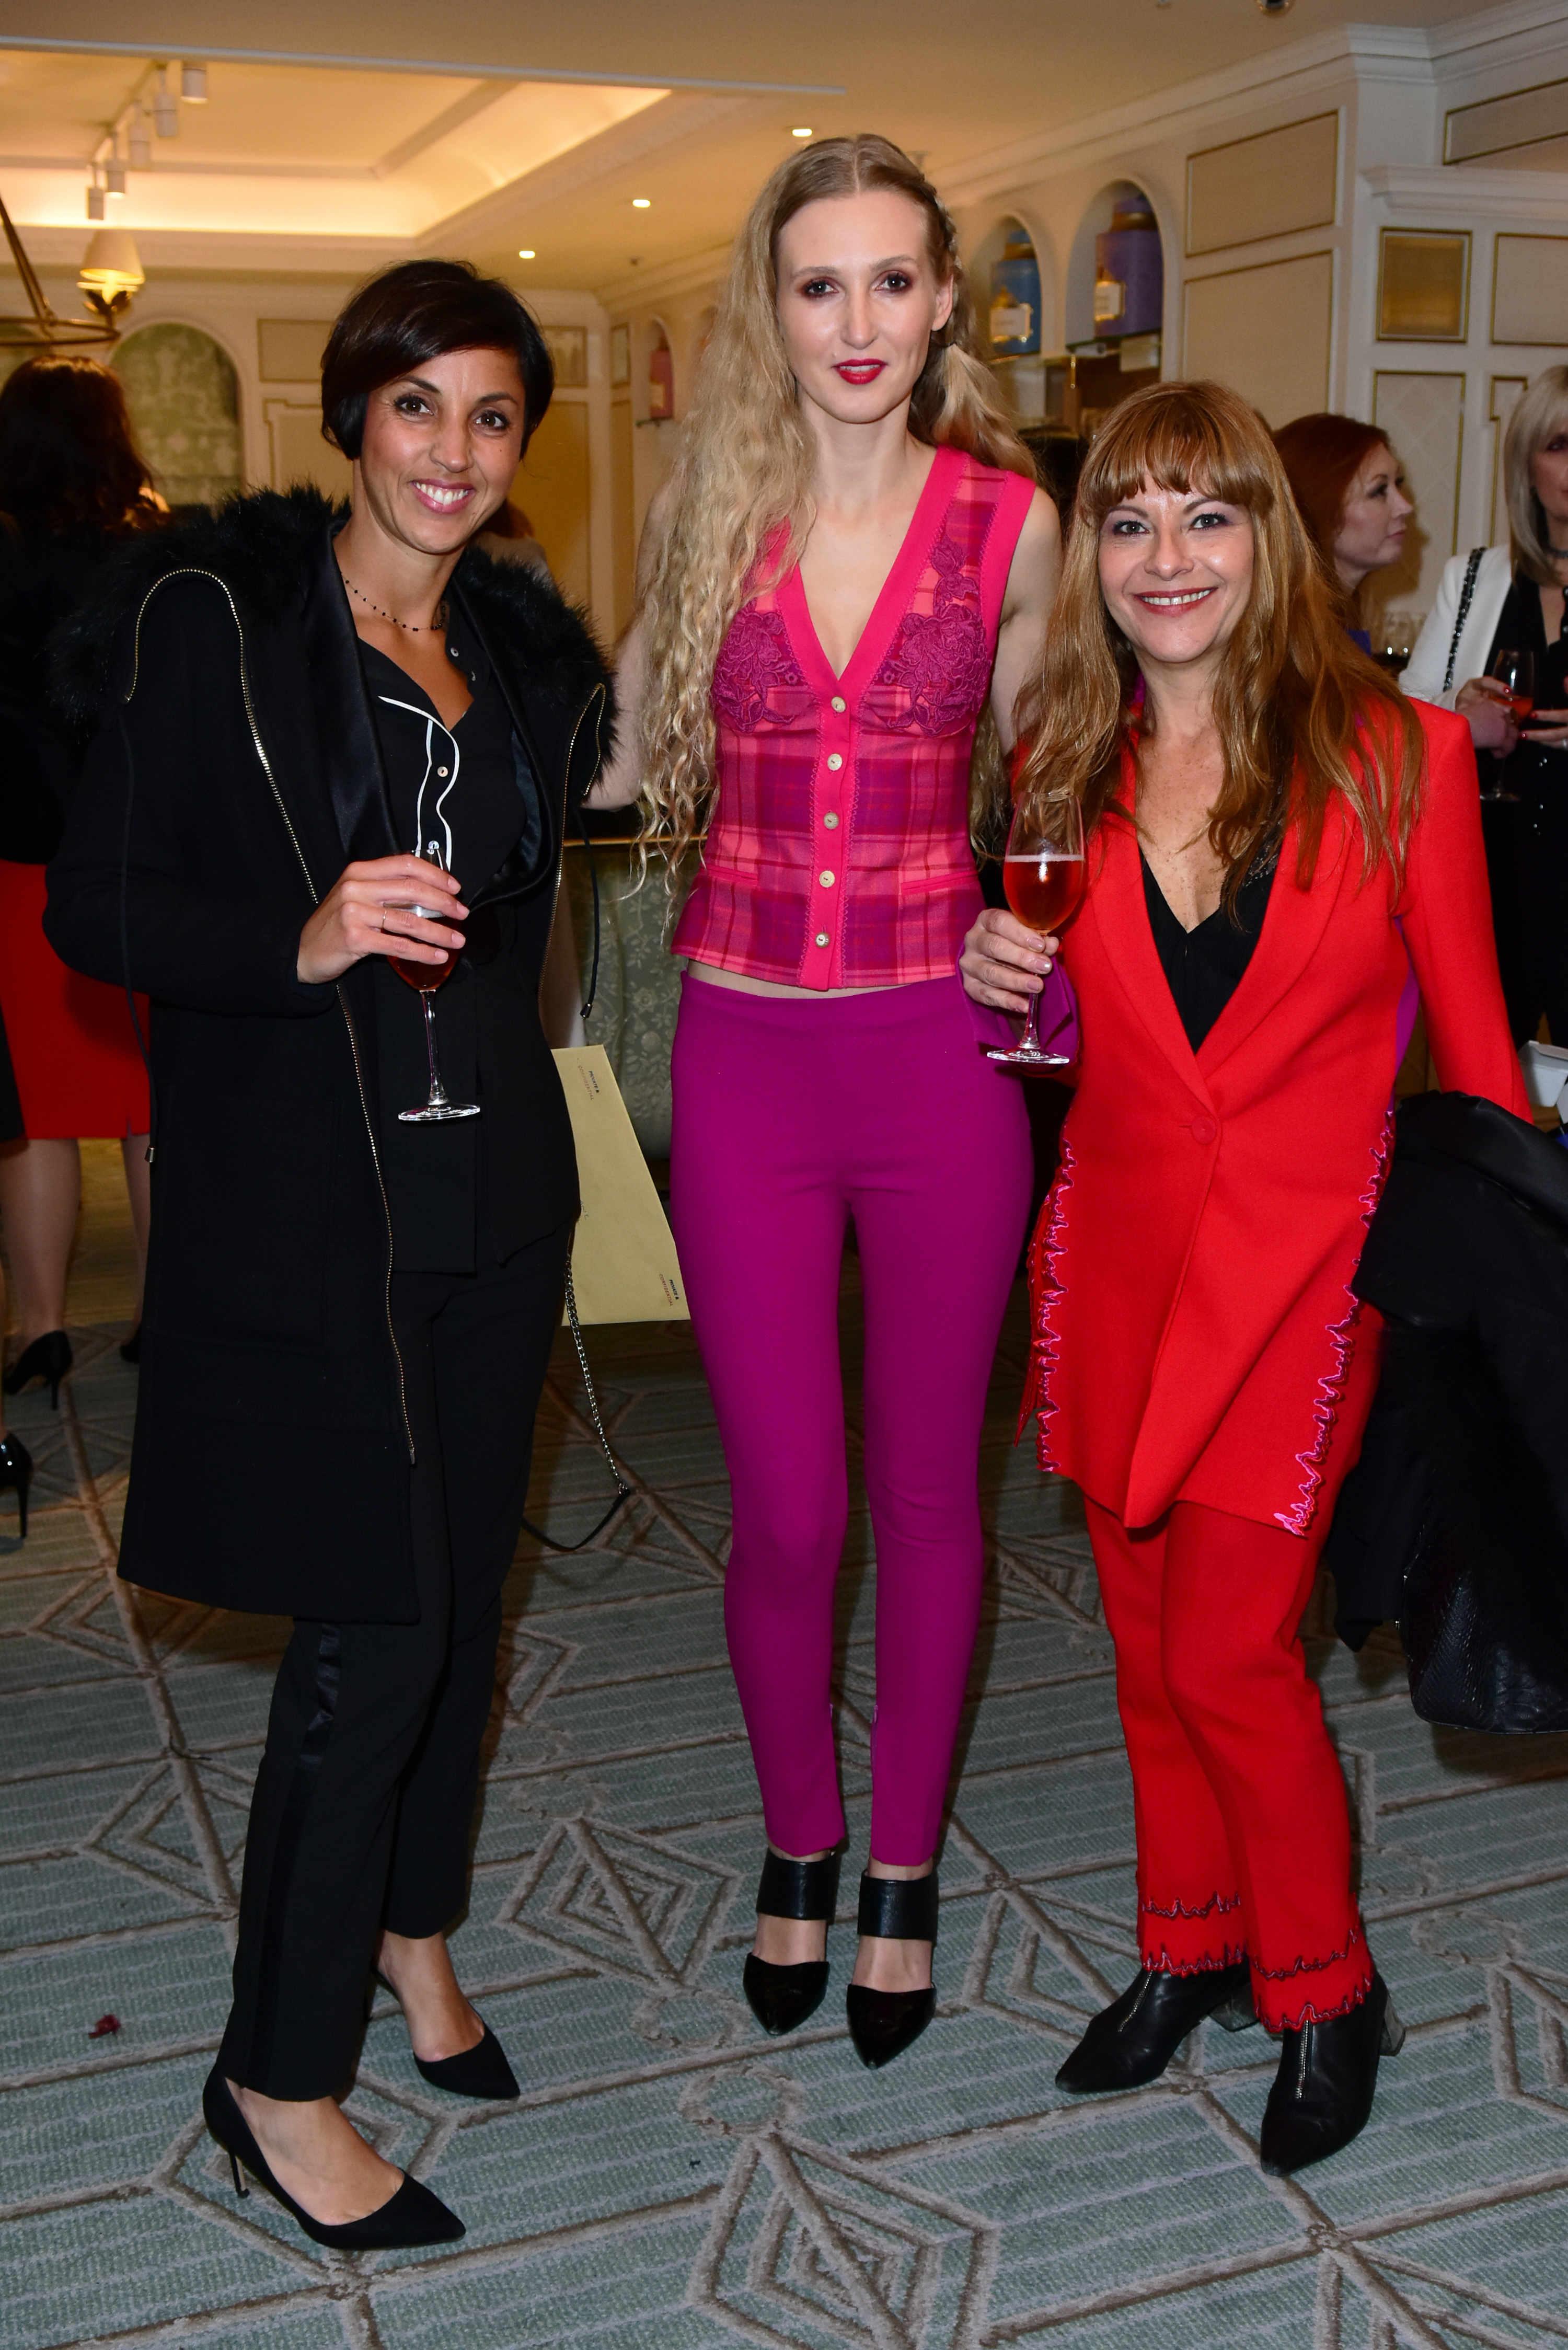 Ghizlane Ennil, Tamara Orlova-Alvarez, Debora Ramos Fortras fashion showcase at Fortnum and Mason. © Joe Alvarez